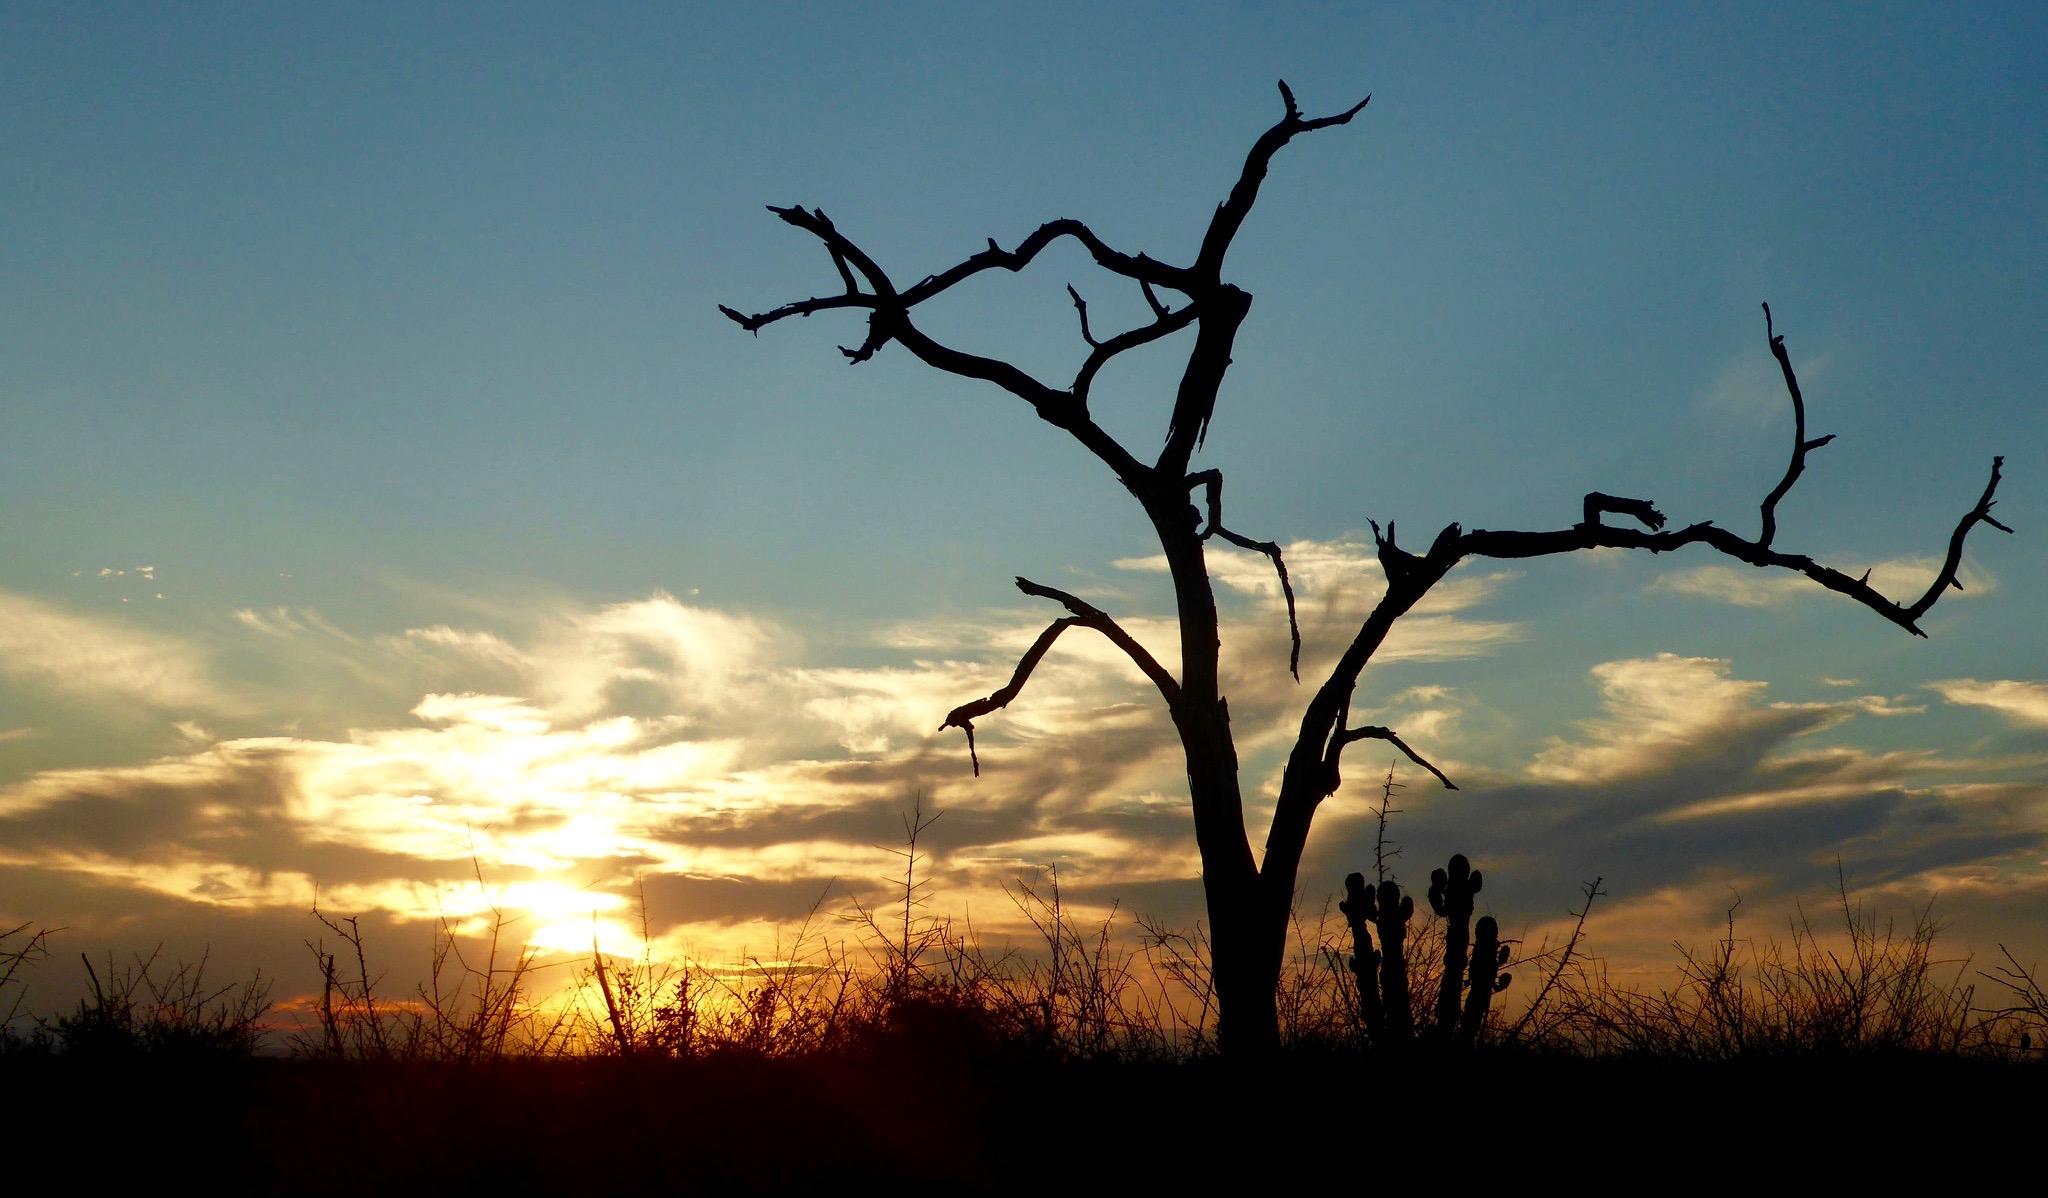 Bild: Sonnenuntergang im Hlune Royal Park